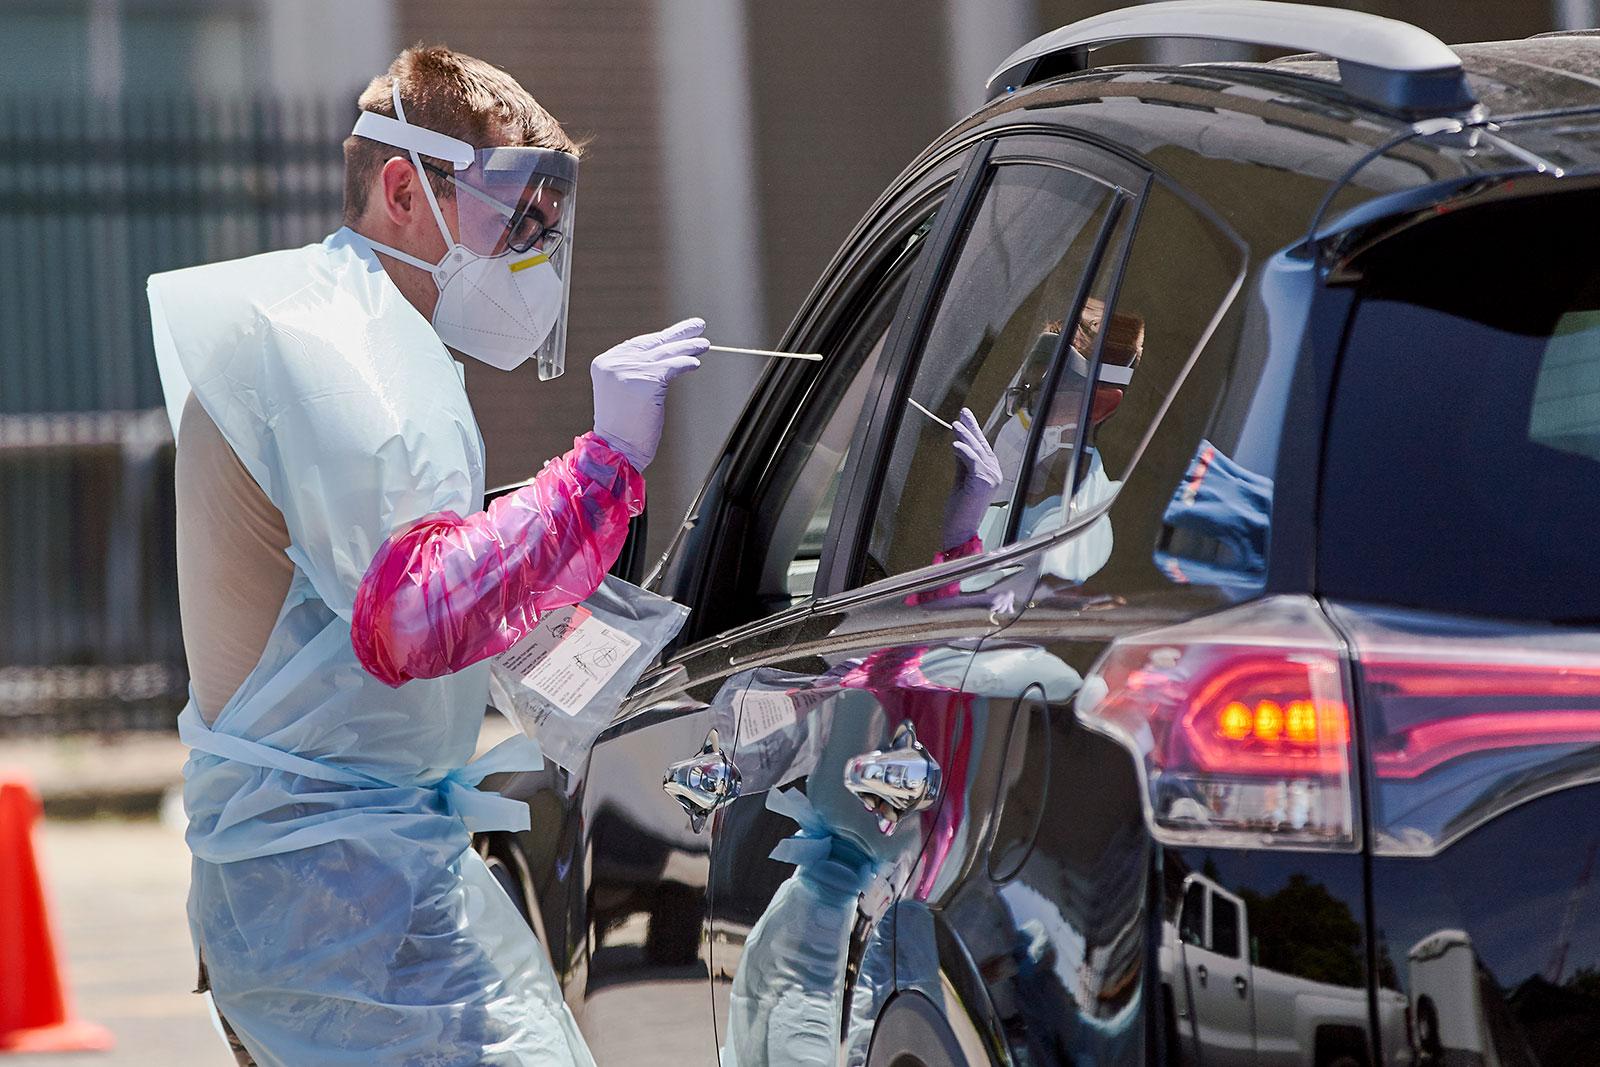 A nurse prepares to administer a coronavirus test in Omaha, Nebraska, on July 10.